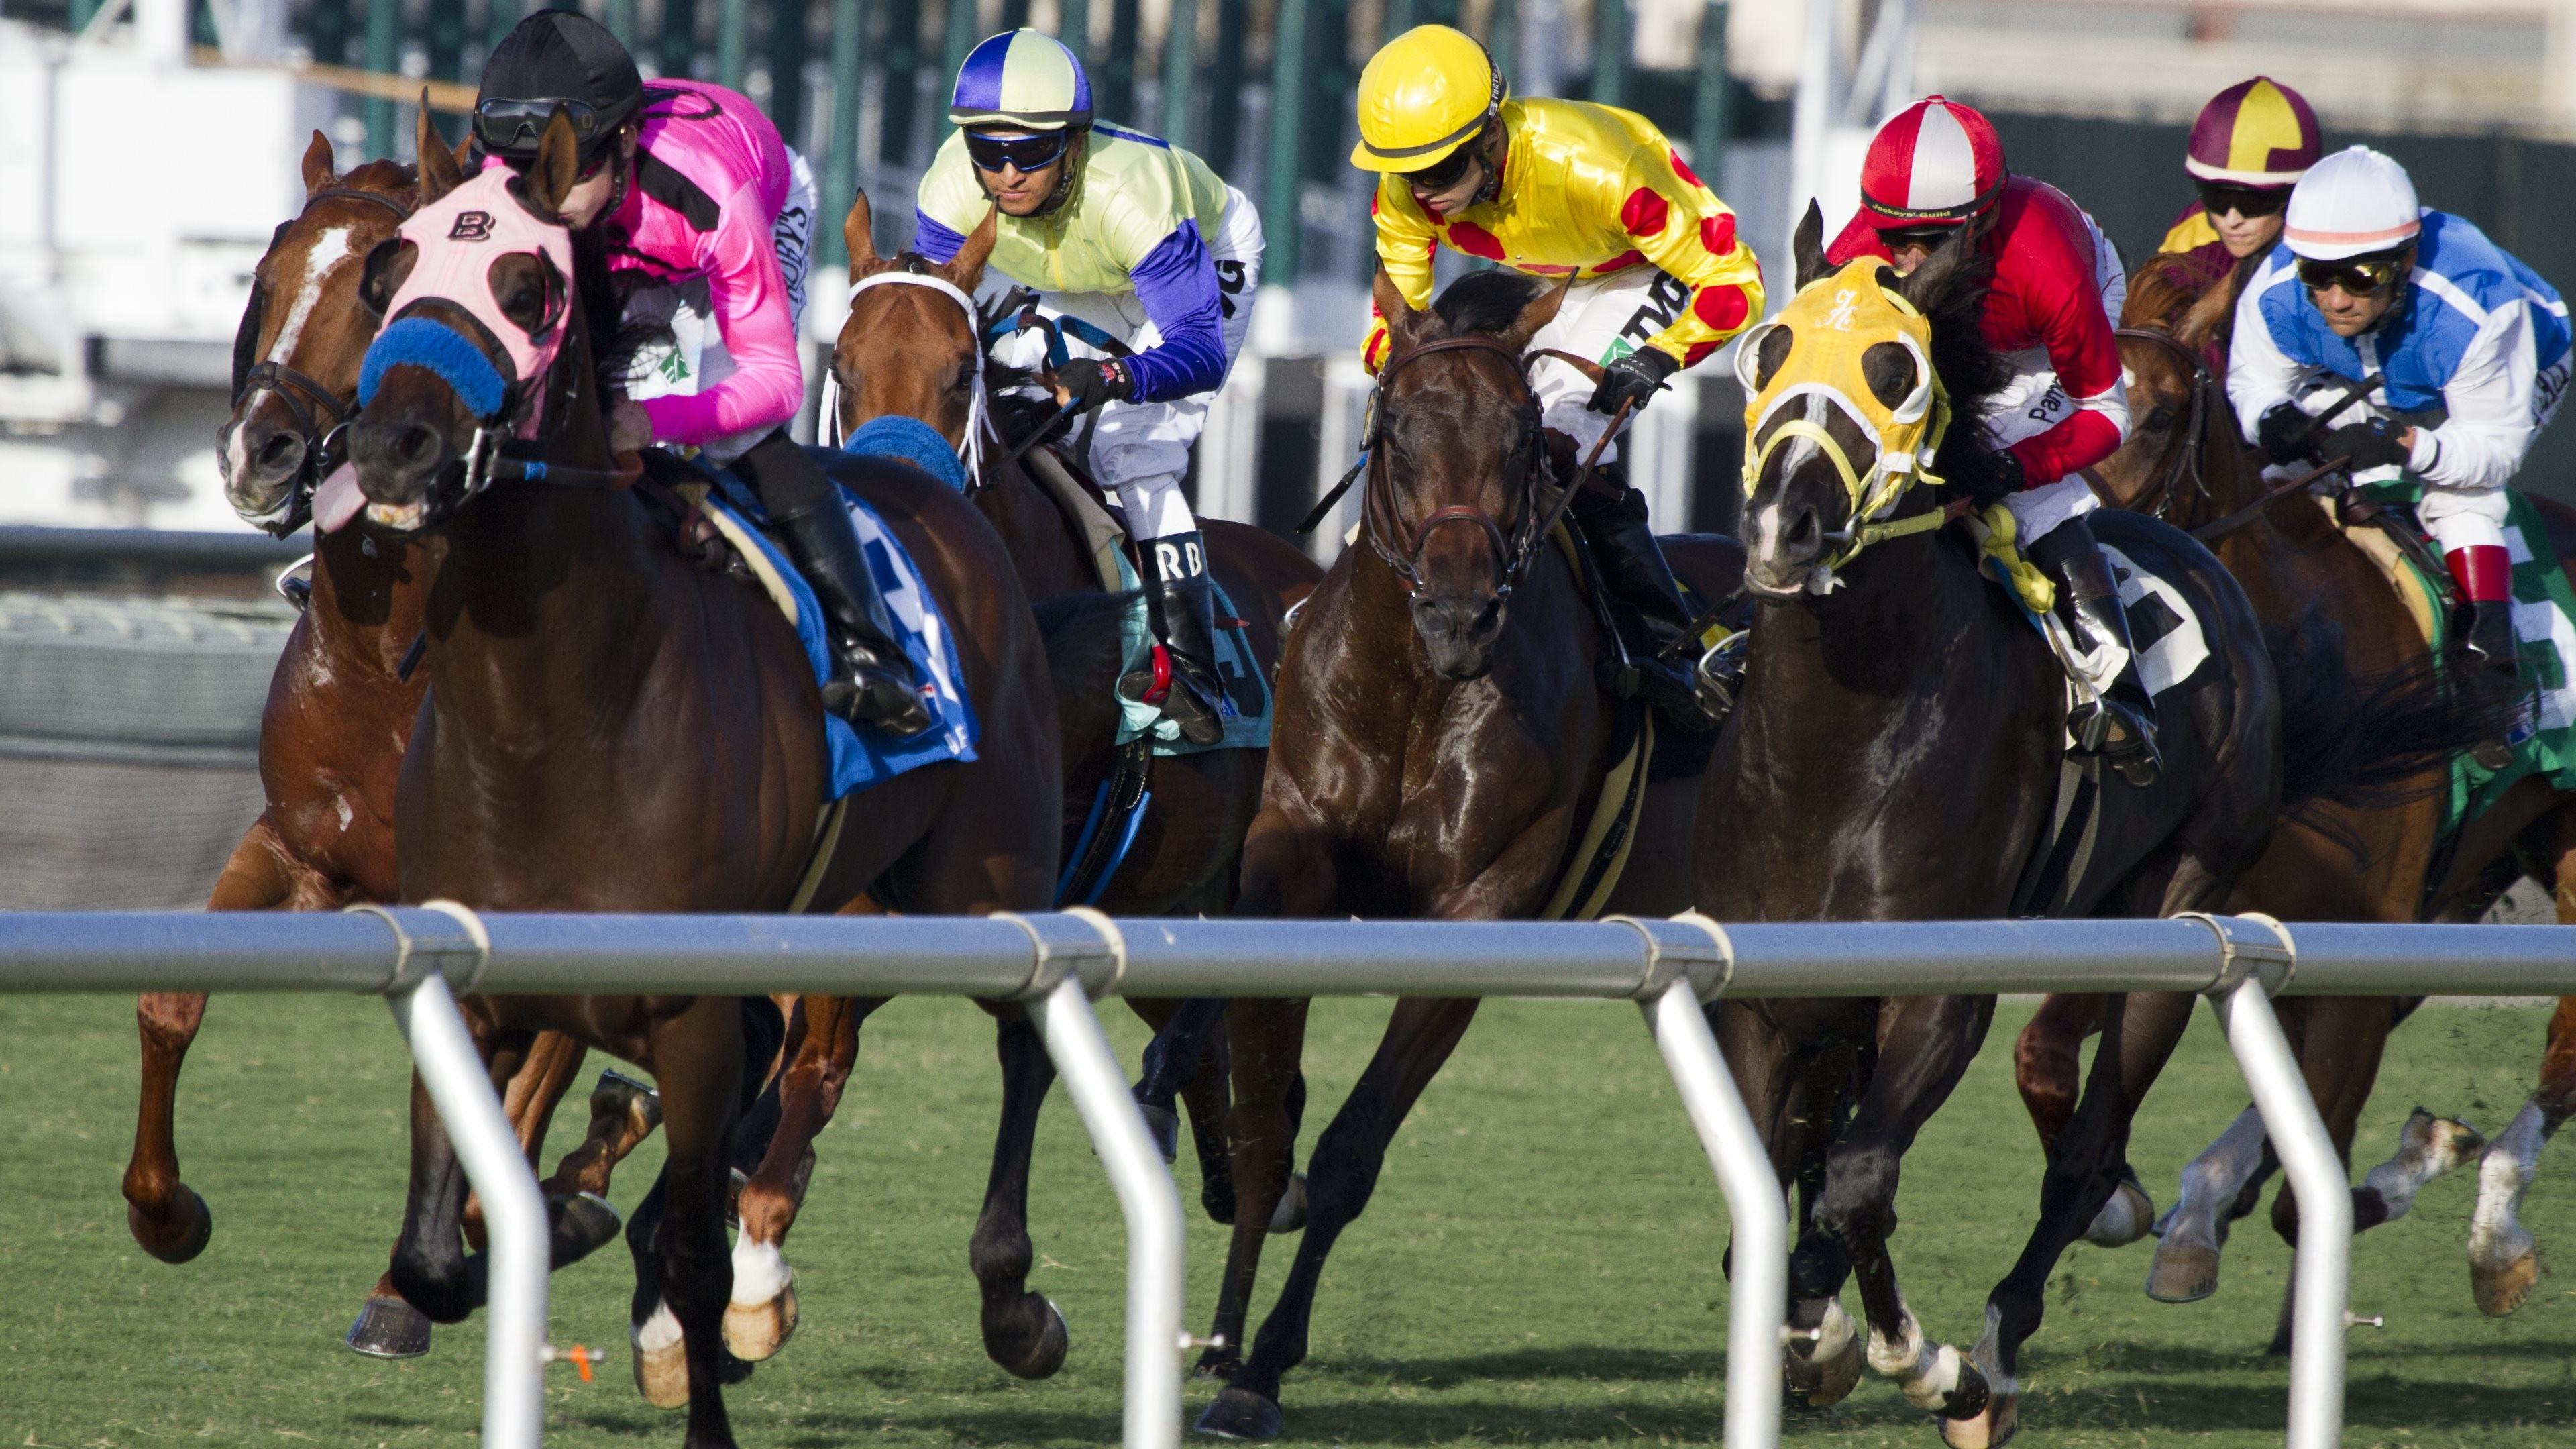 horse racing wallpaper,horse,sports,vertebrate,bridle,mammal